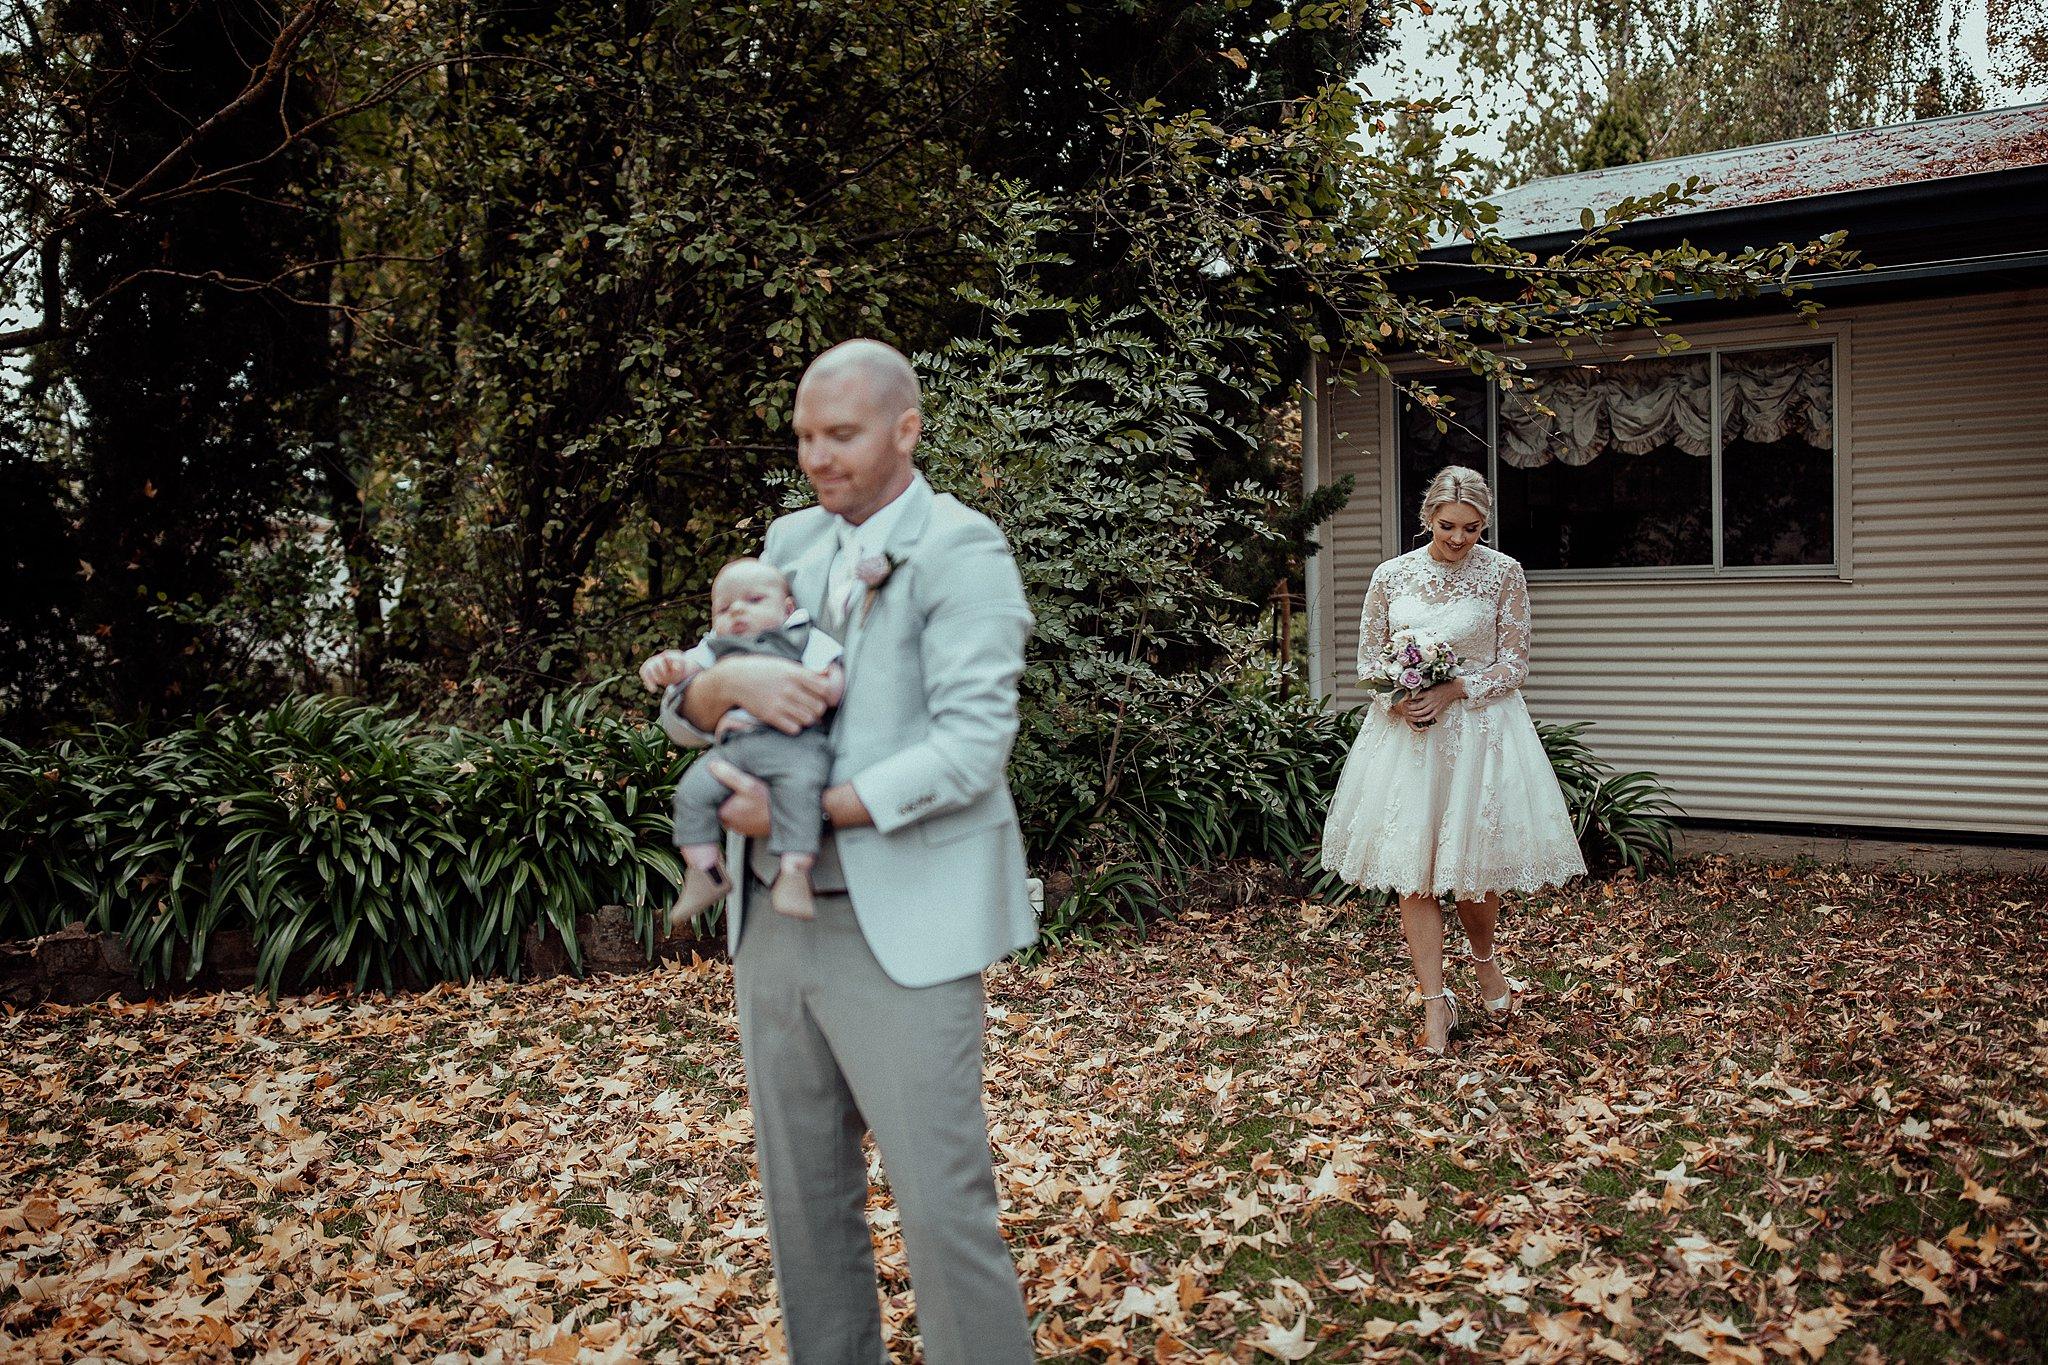 mickalathomas_puremacphotography_weddingphotographer_couplephotographer_Sheppartonphotographer_3407.jpg